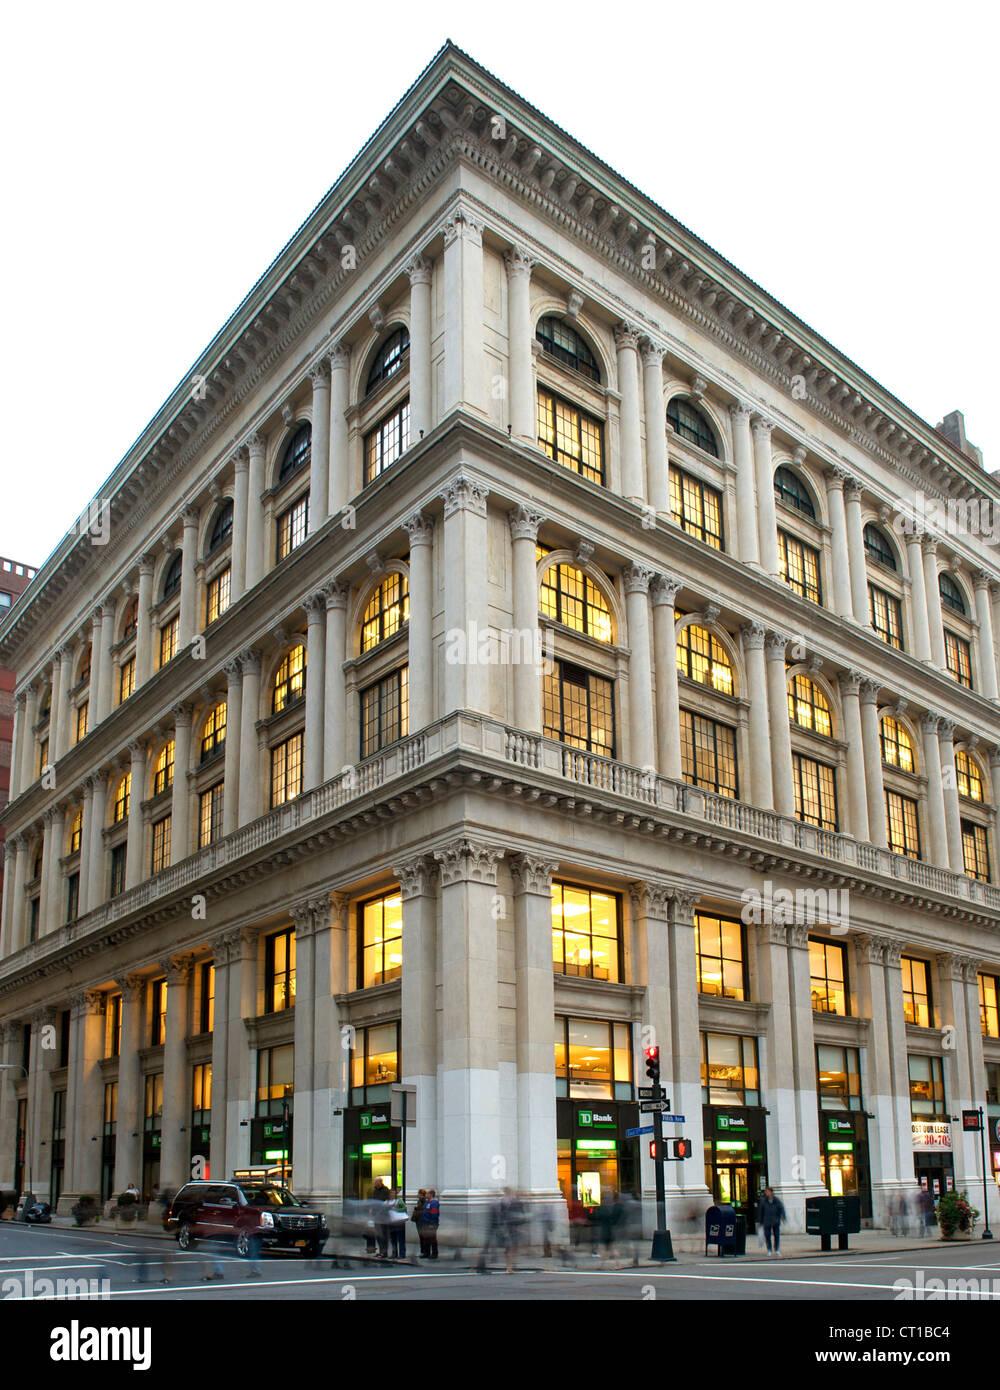 Tiffany building in manhattan new york city usa stock for Tiffany a new york